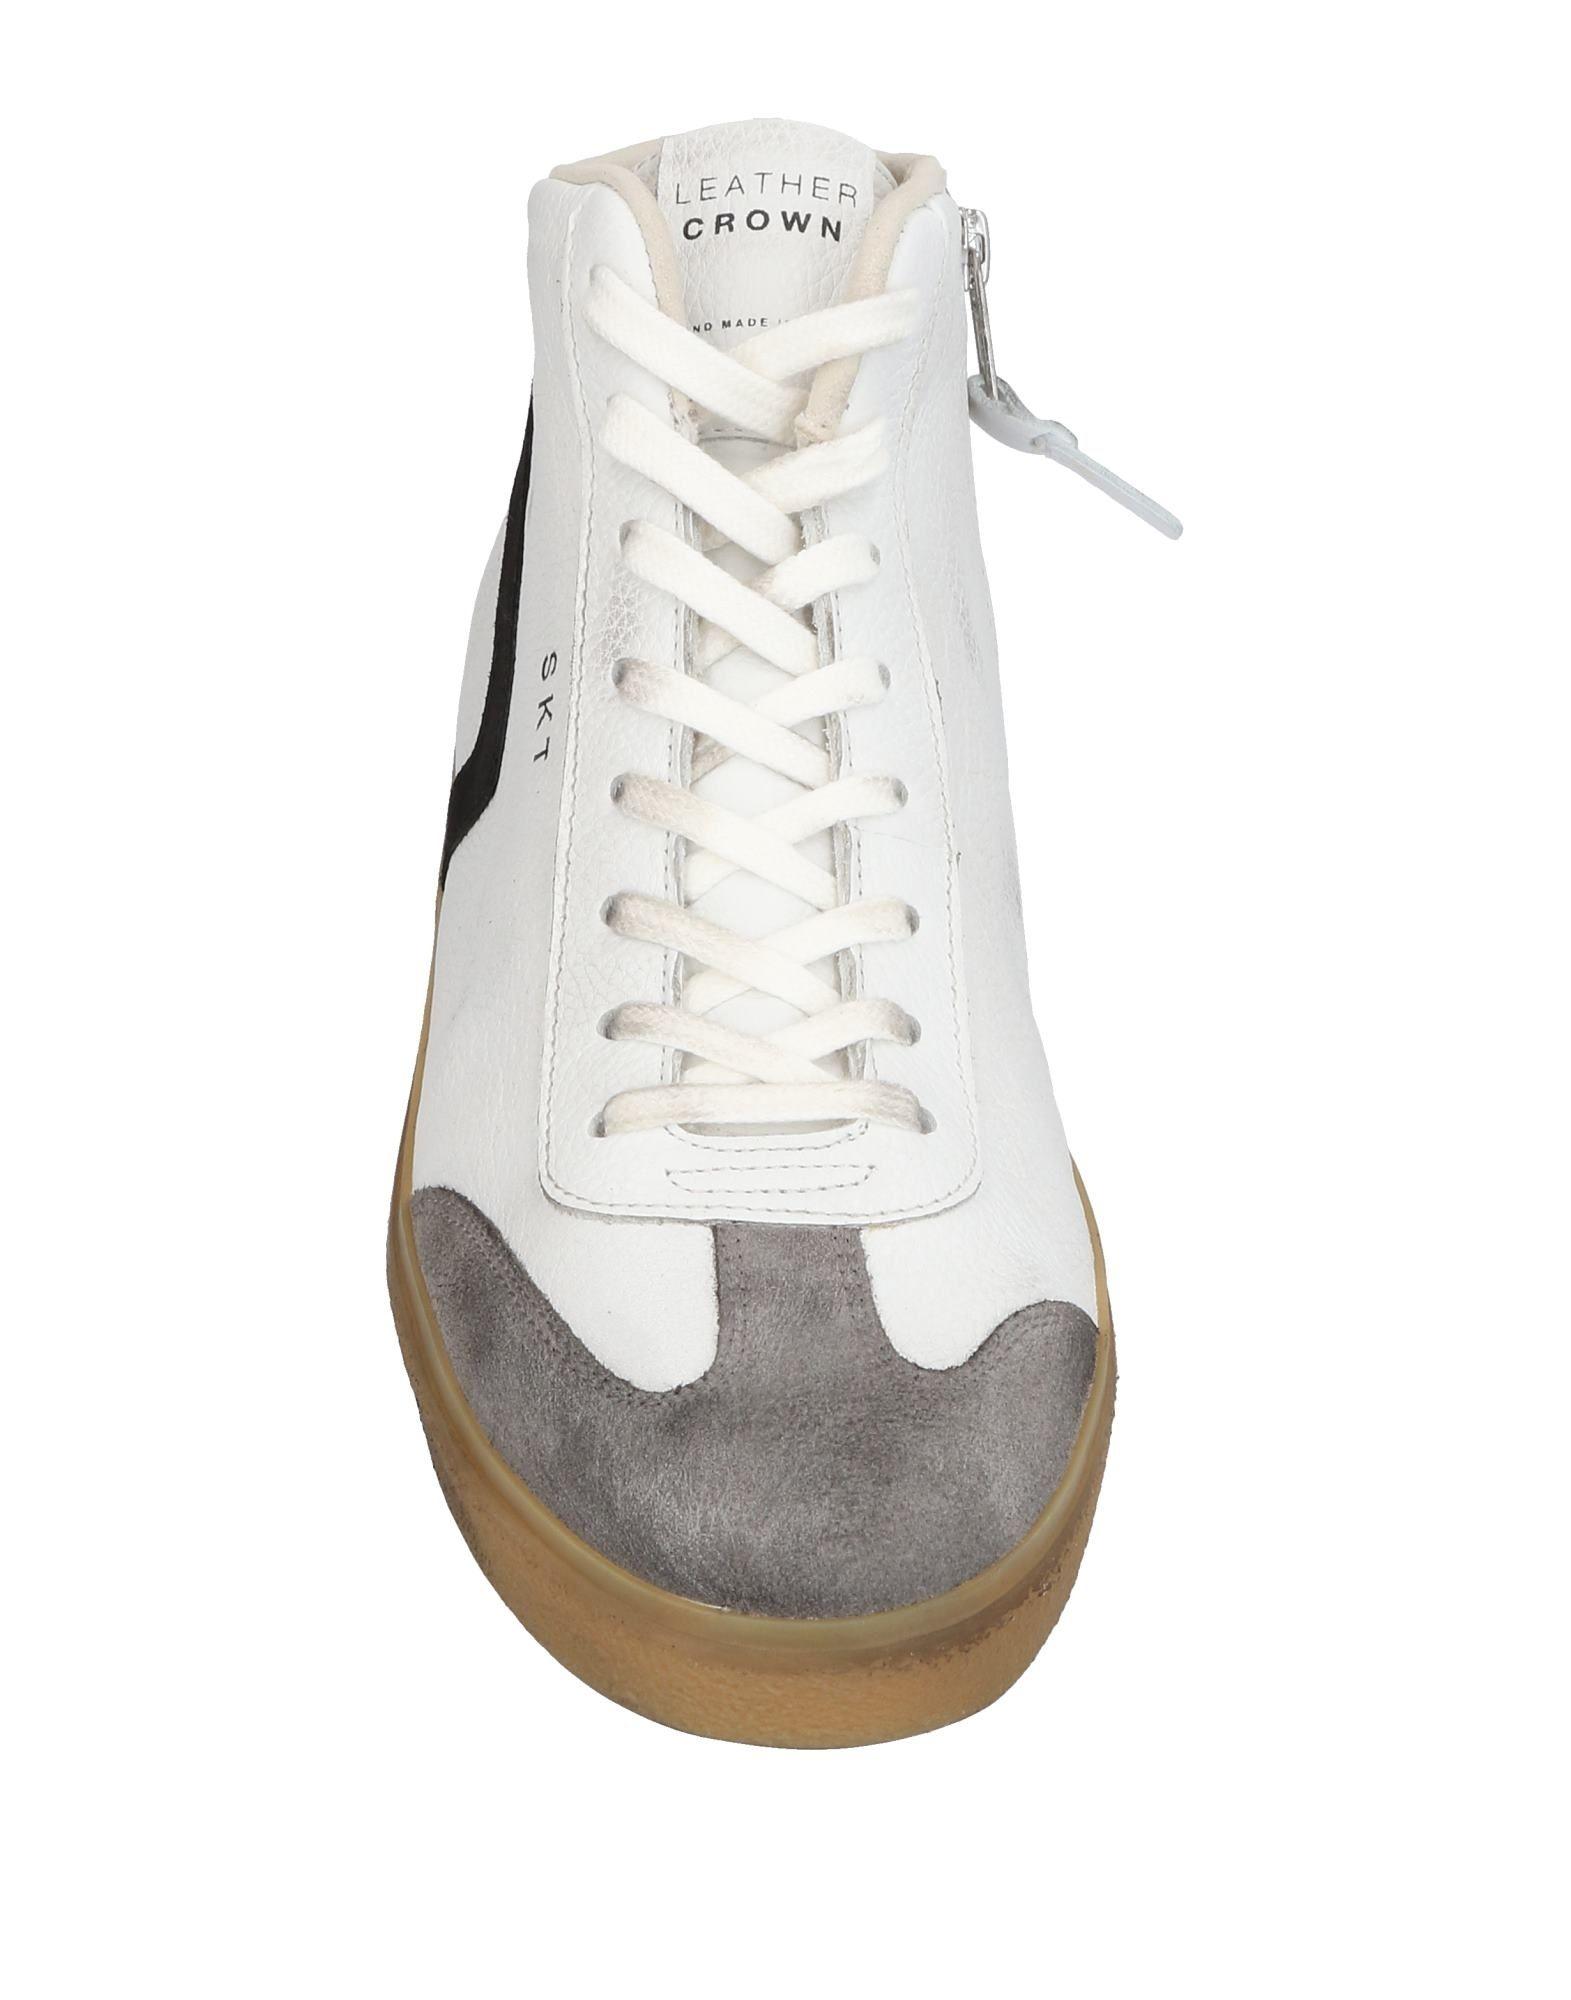 Leather Crown Sneakers Herren  11453724EA Neue Neue Neue Schuhe baf684